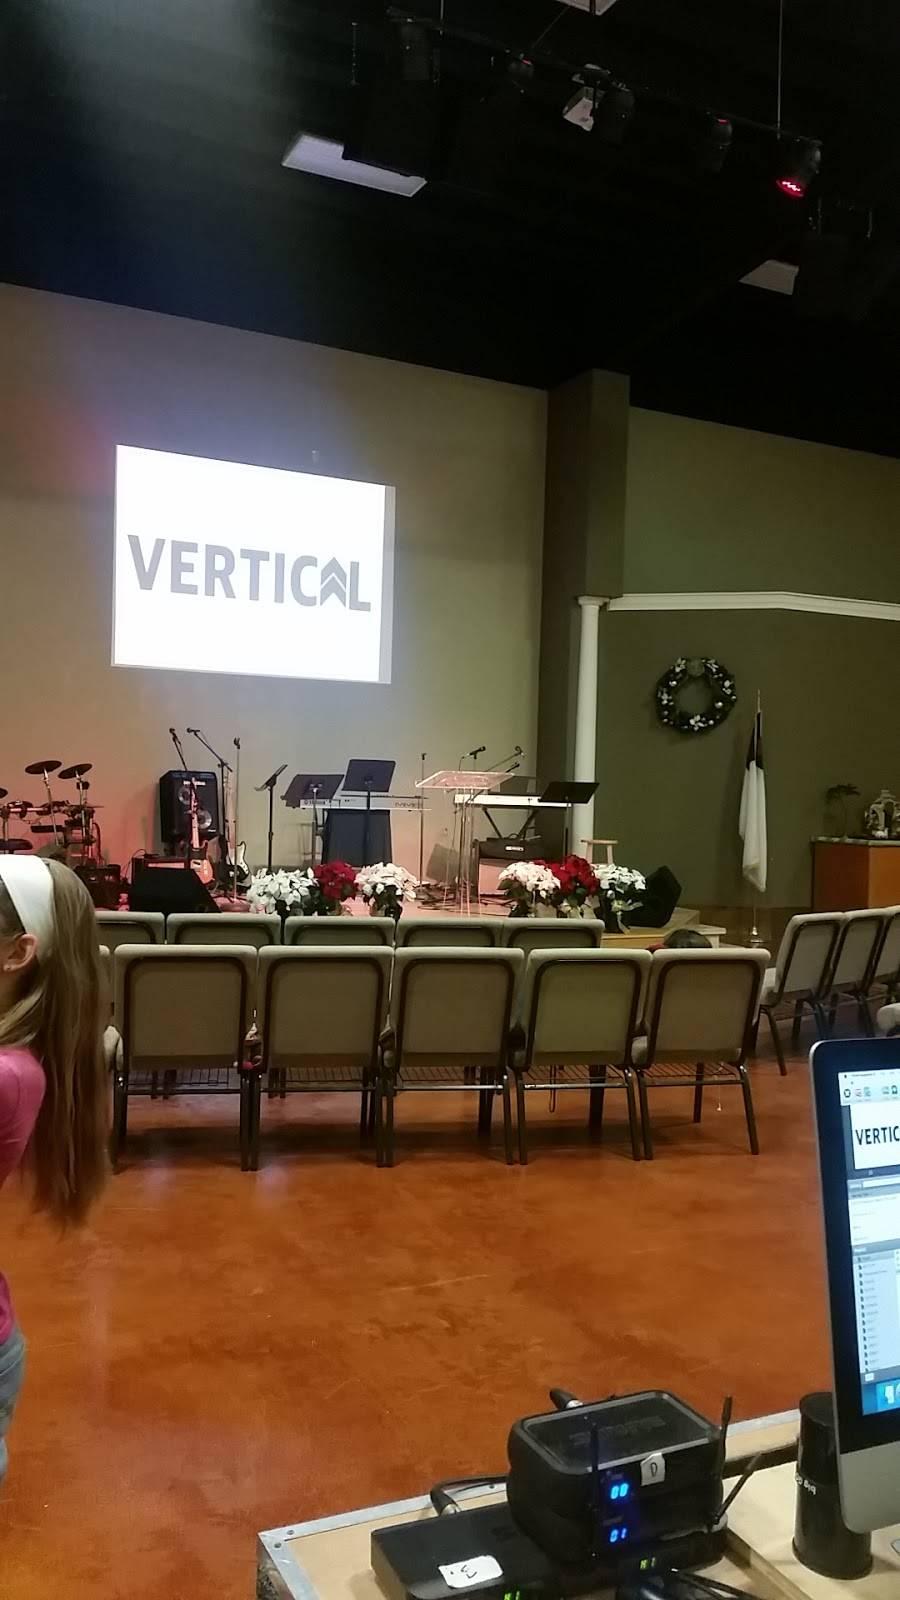 Southpointe Baptist Church - church  | Photo 3 of 7 | Address: 901 Debbie Ln, Arlington, TX 76002, USA | Phone: (817) 453-5550